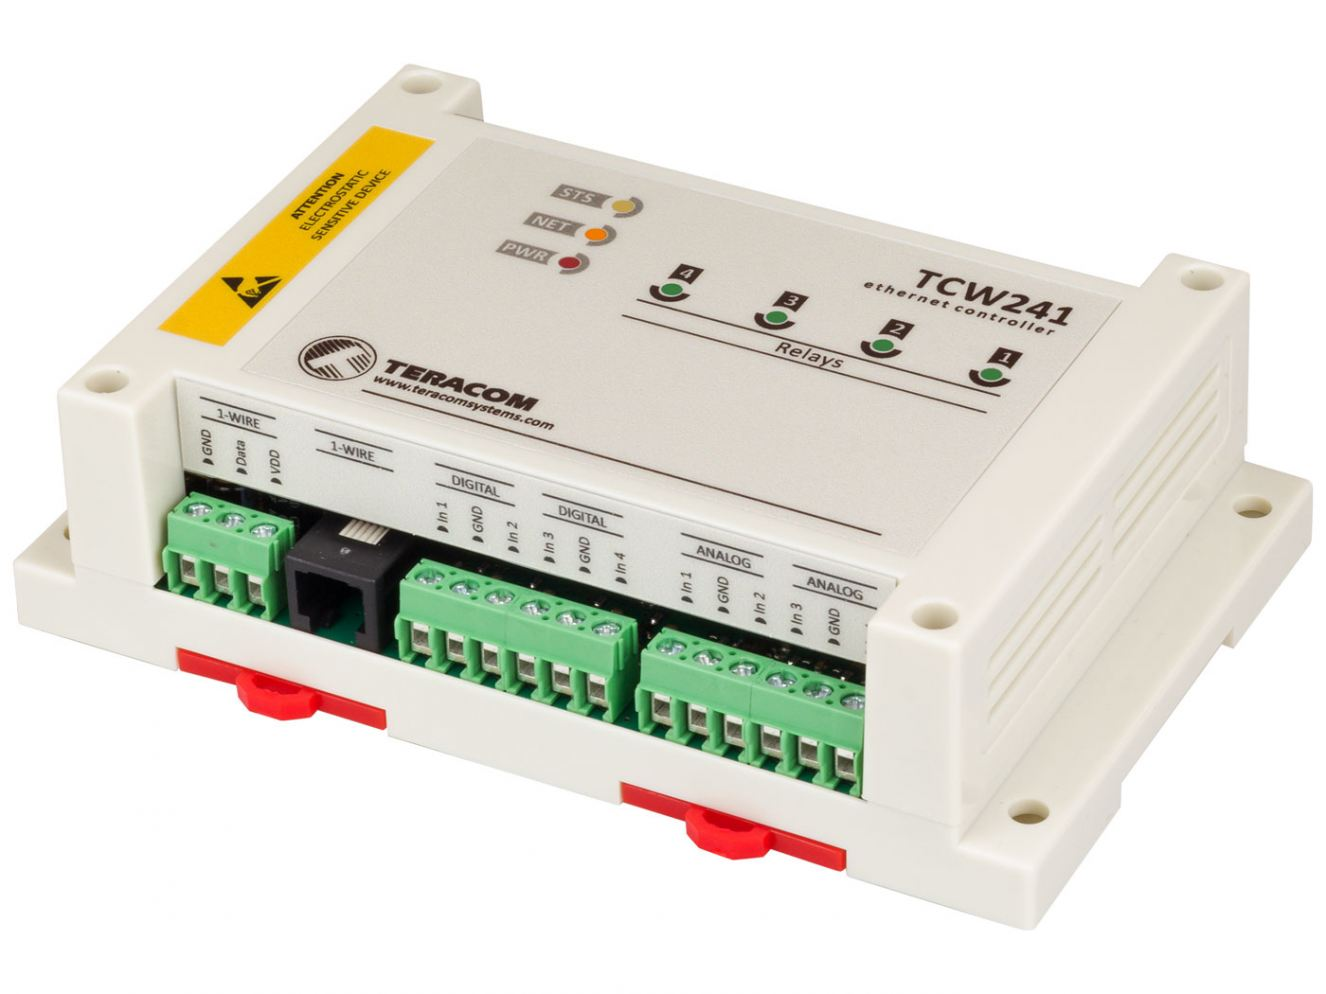 Teracom Launches TCW241 Ethernet IO Module